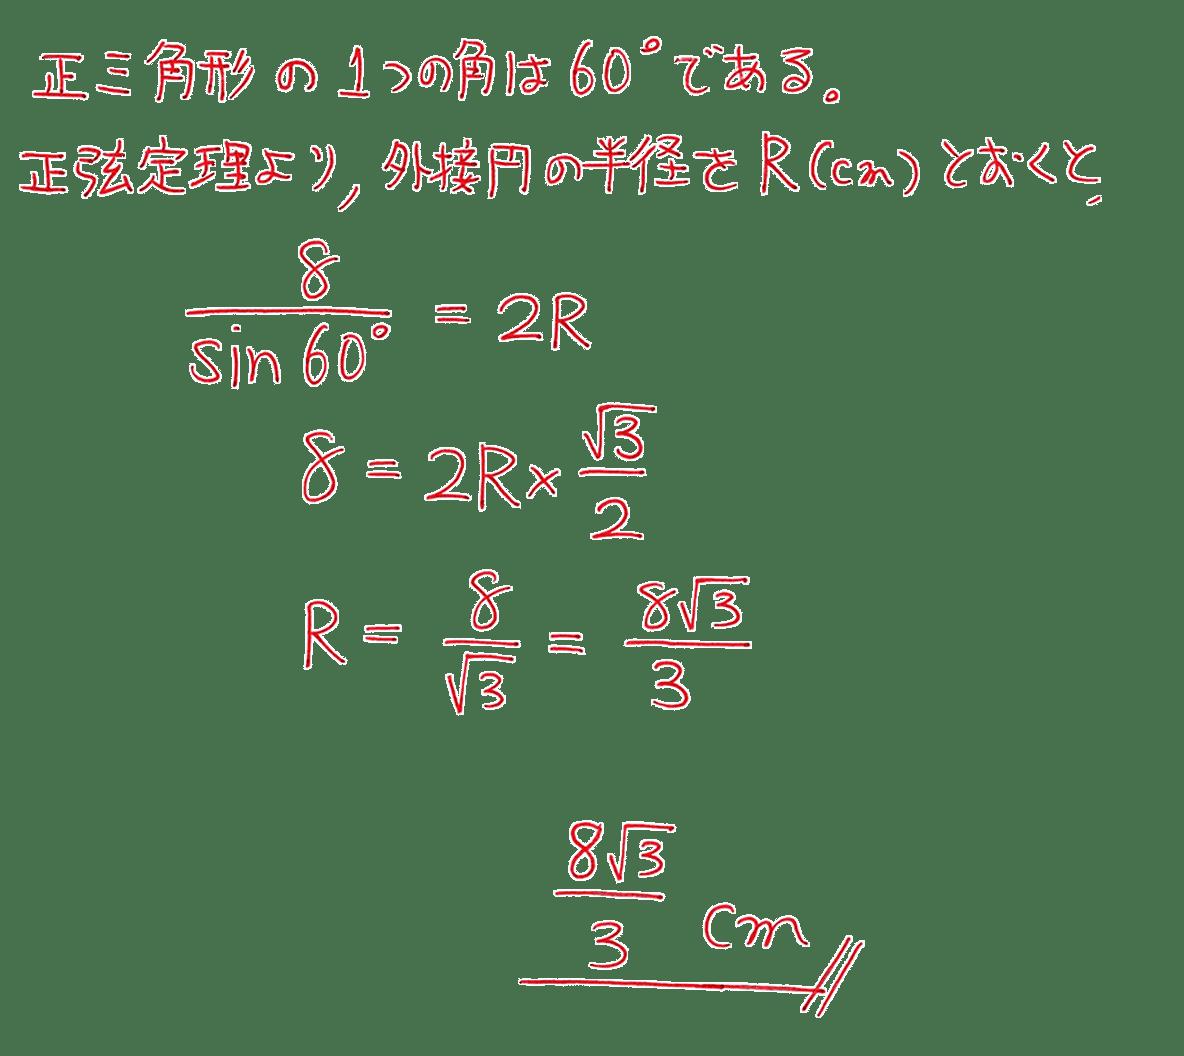 高校数学Ⅰ 三角比21 練習の答え